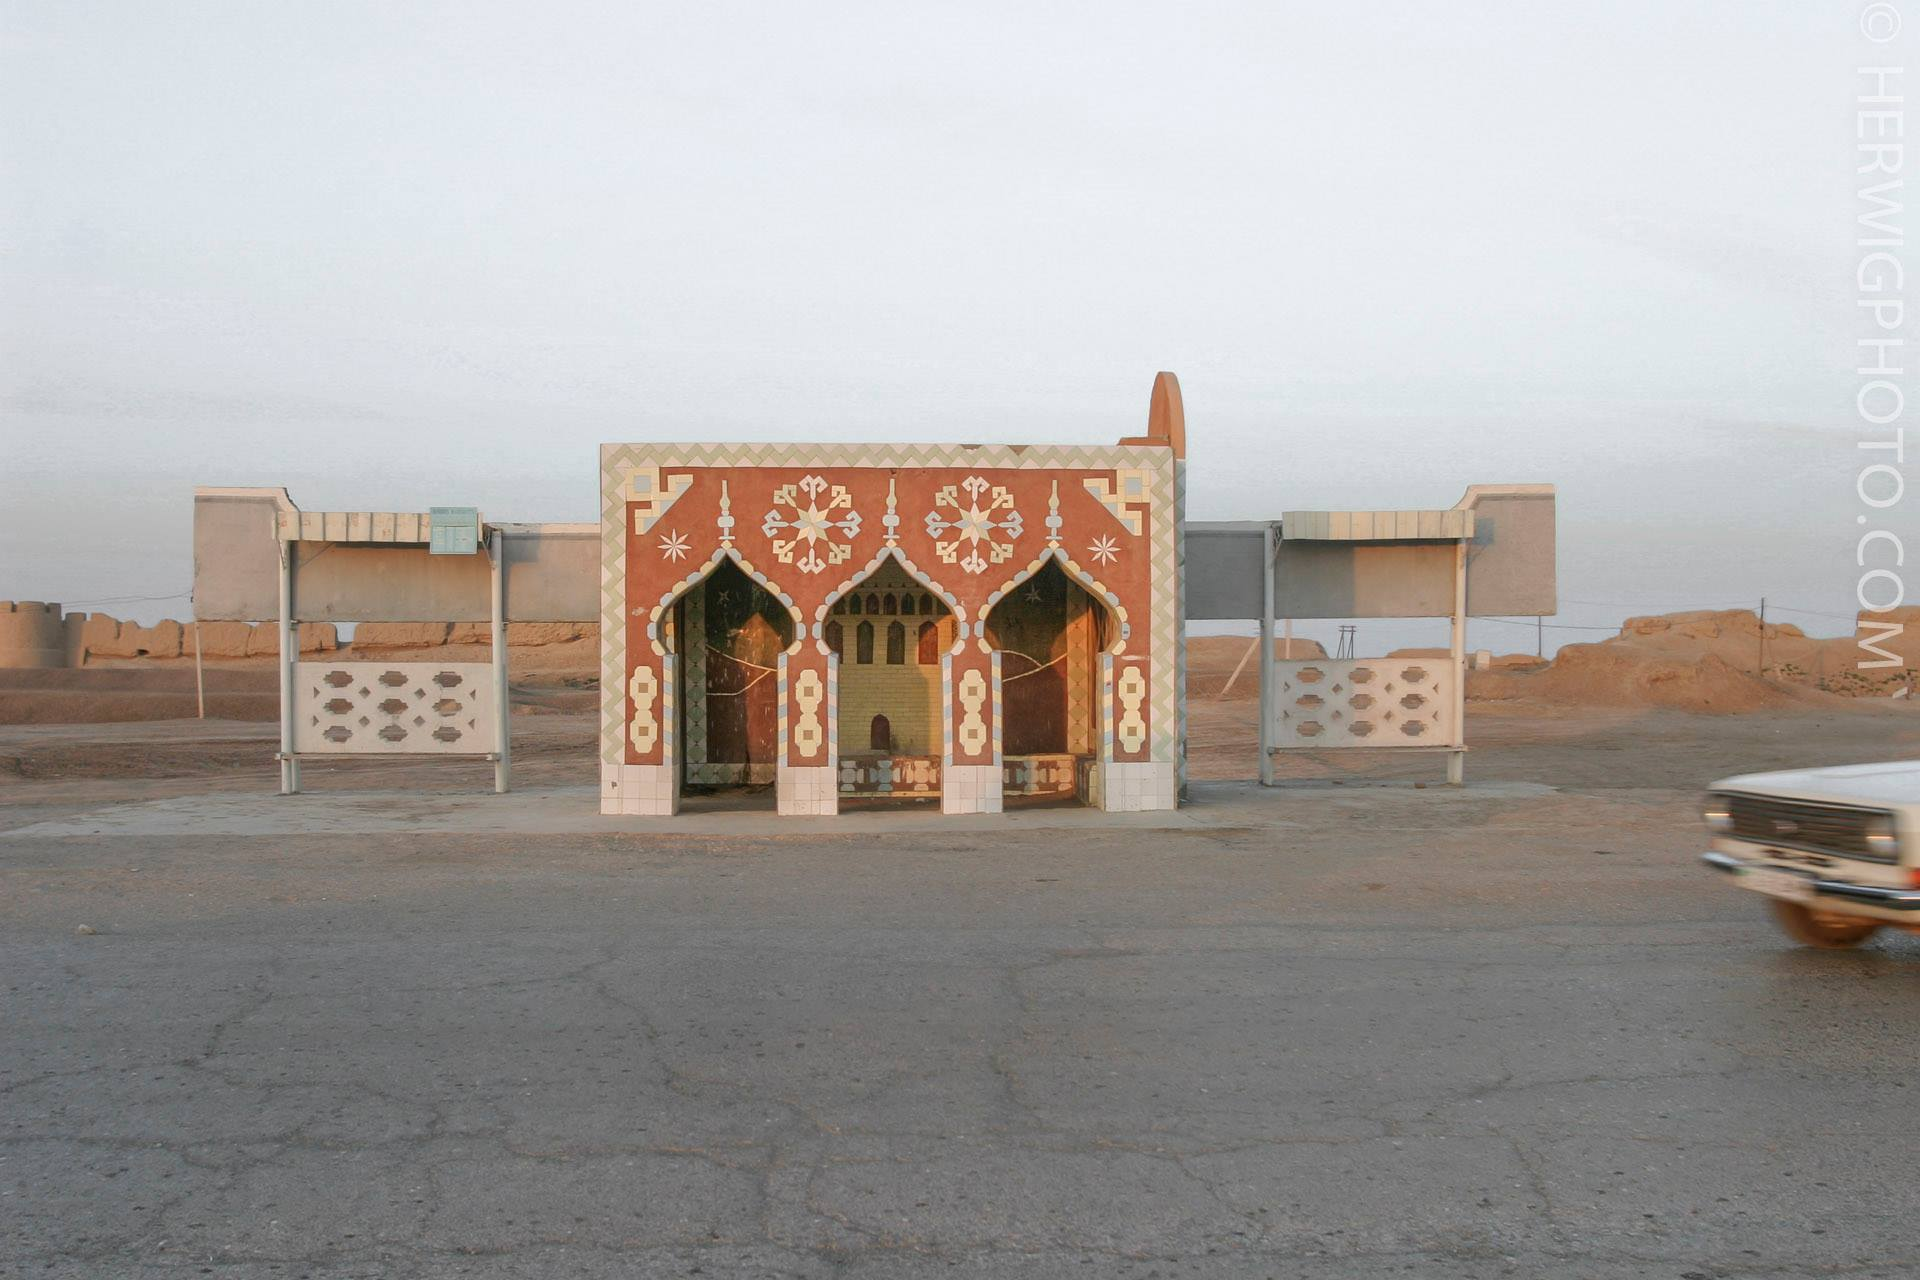 Soviet Bus Stops - Christopher Herwig - Merv, Turkmenistan, 2005